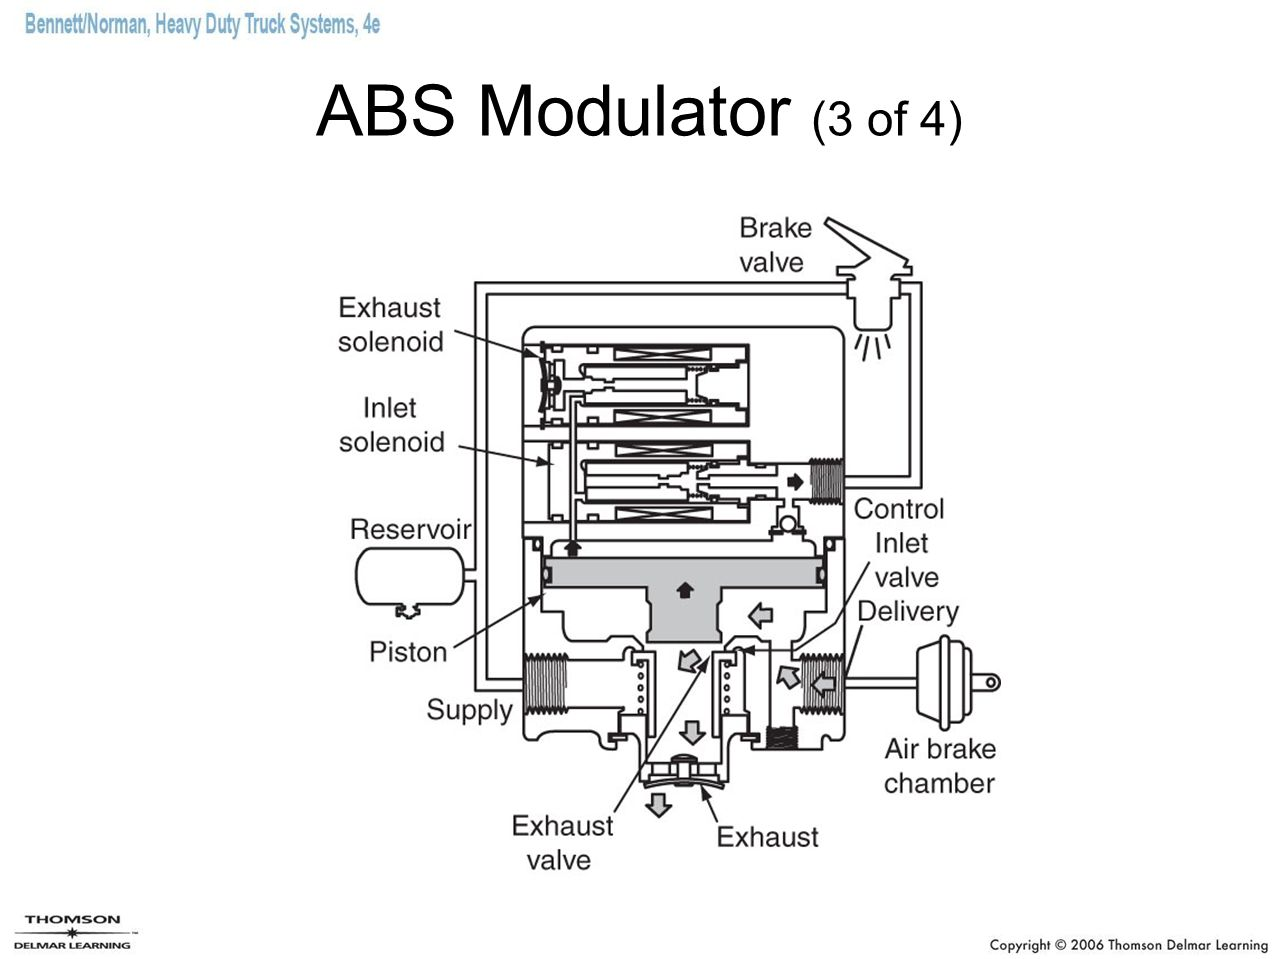 ABS Modulator (3 of 4)